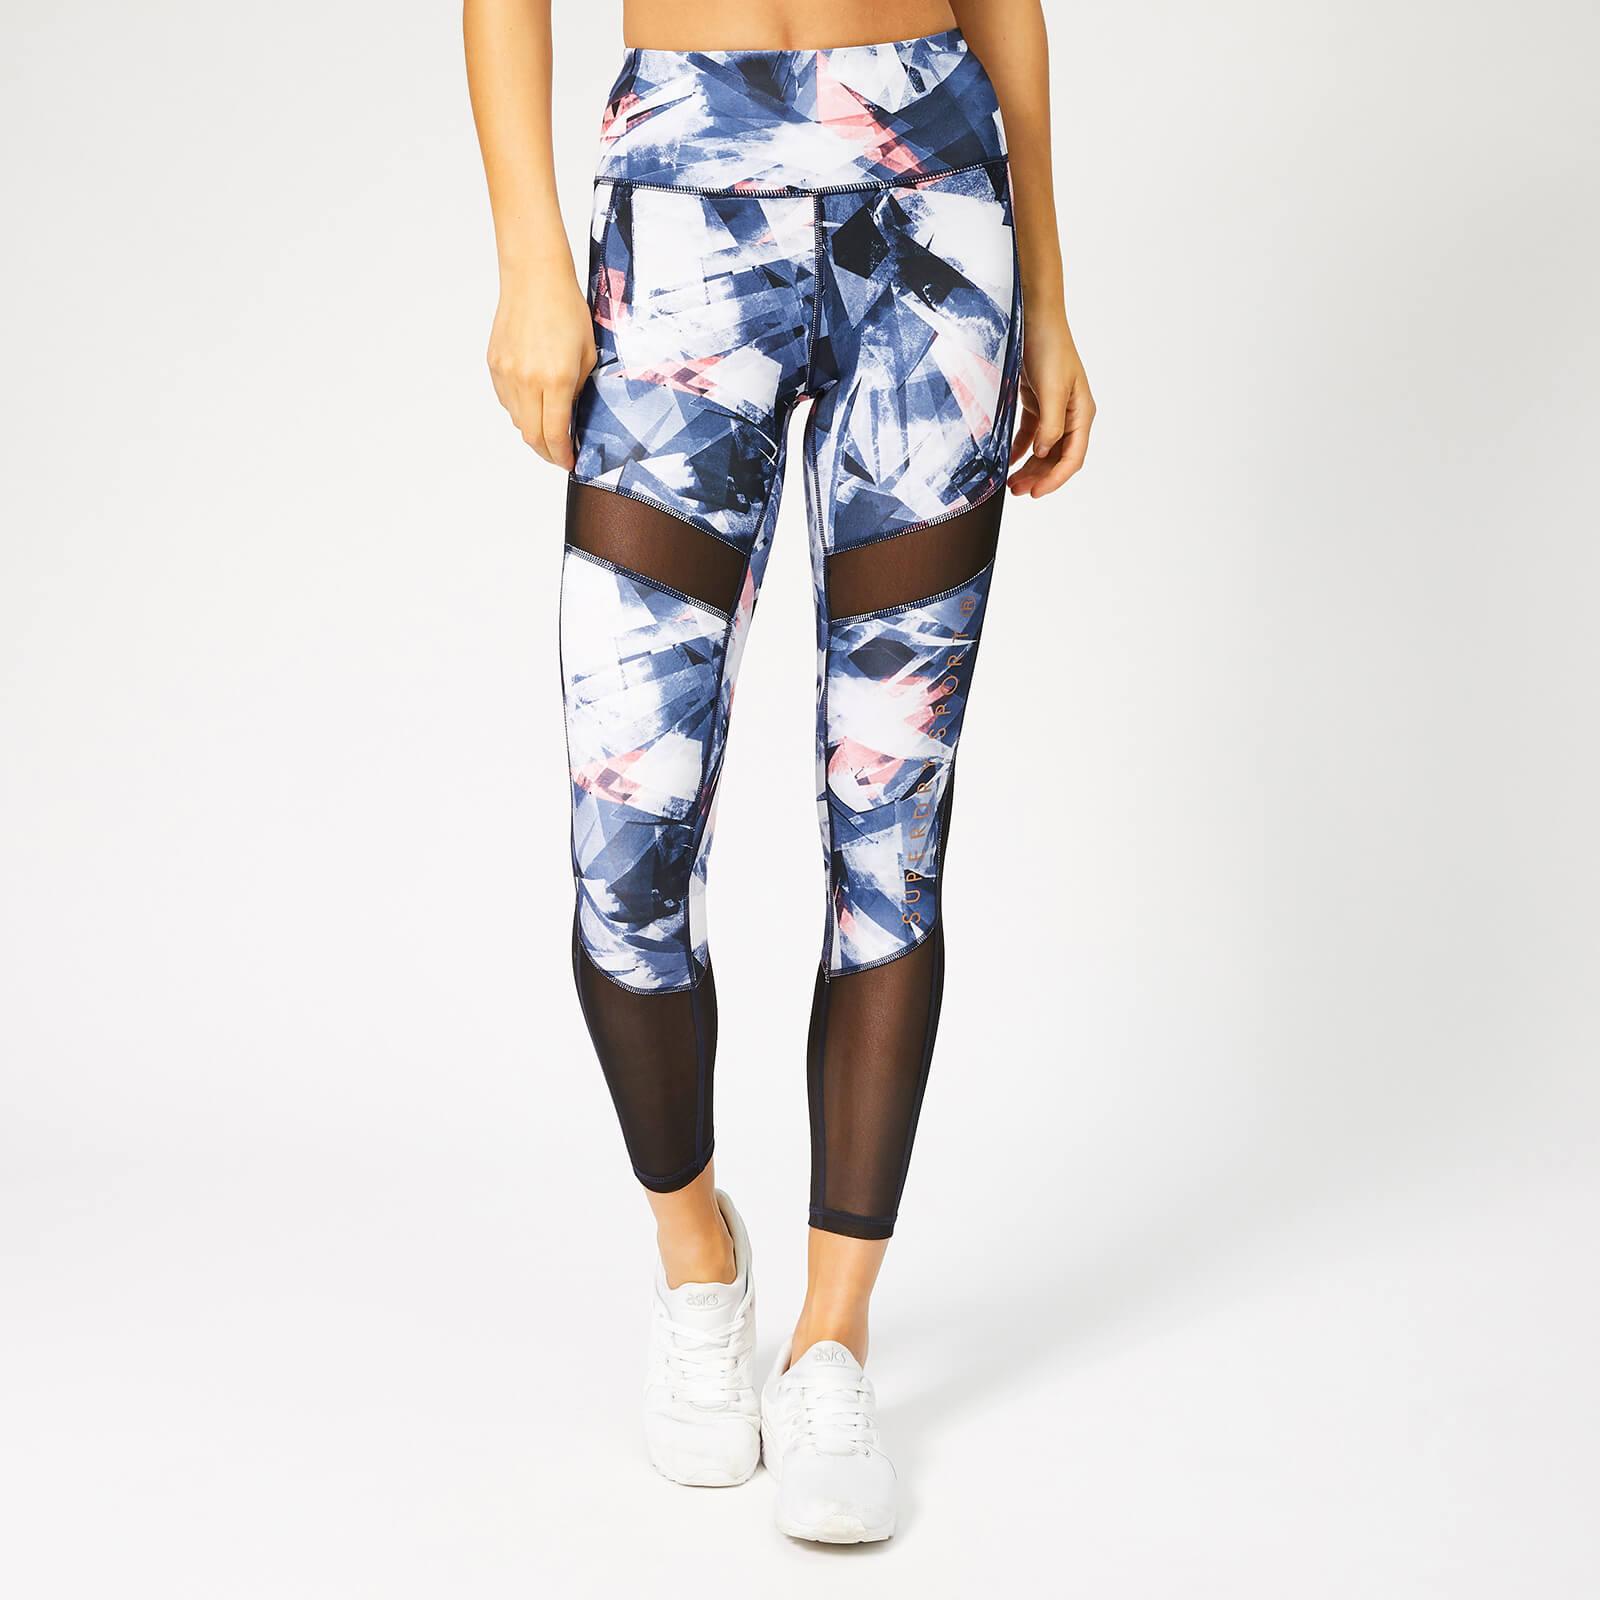 Superdry Sport Women's Active Studio Mesh Leggings - Violet Shard Print - L - Blue